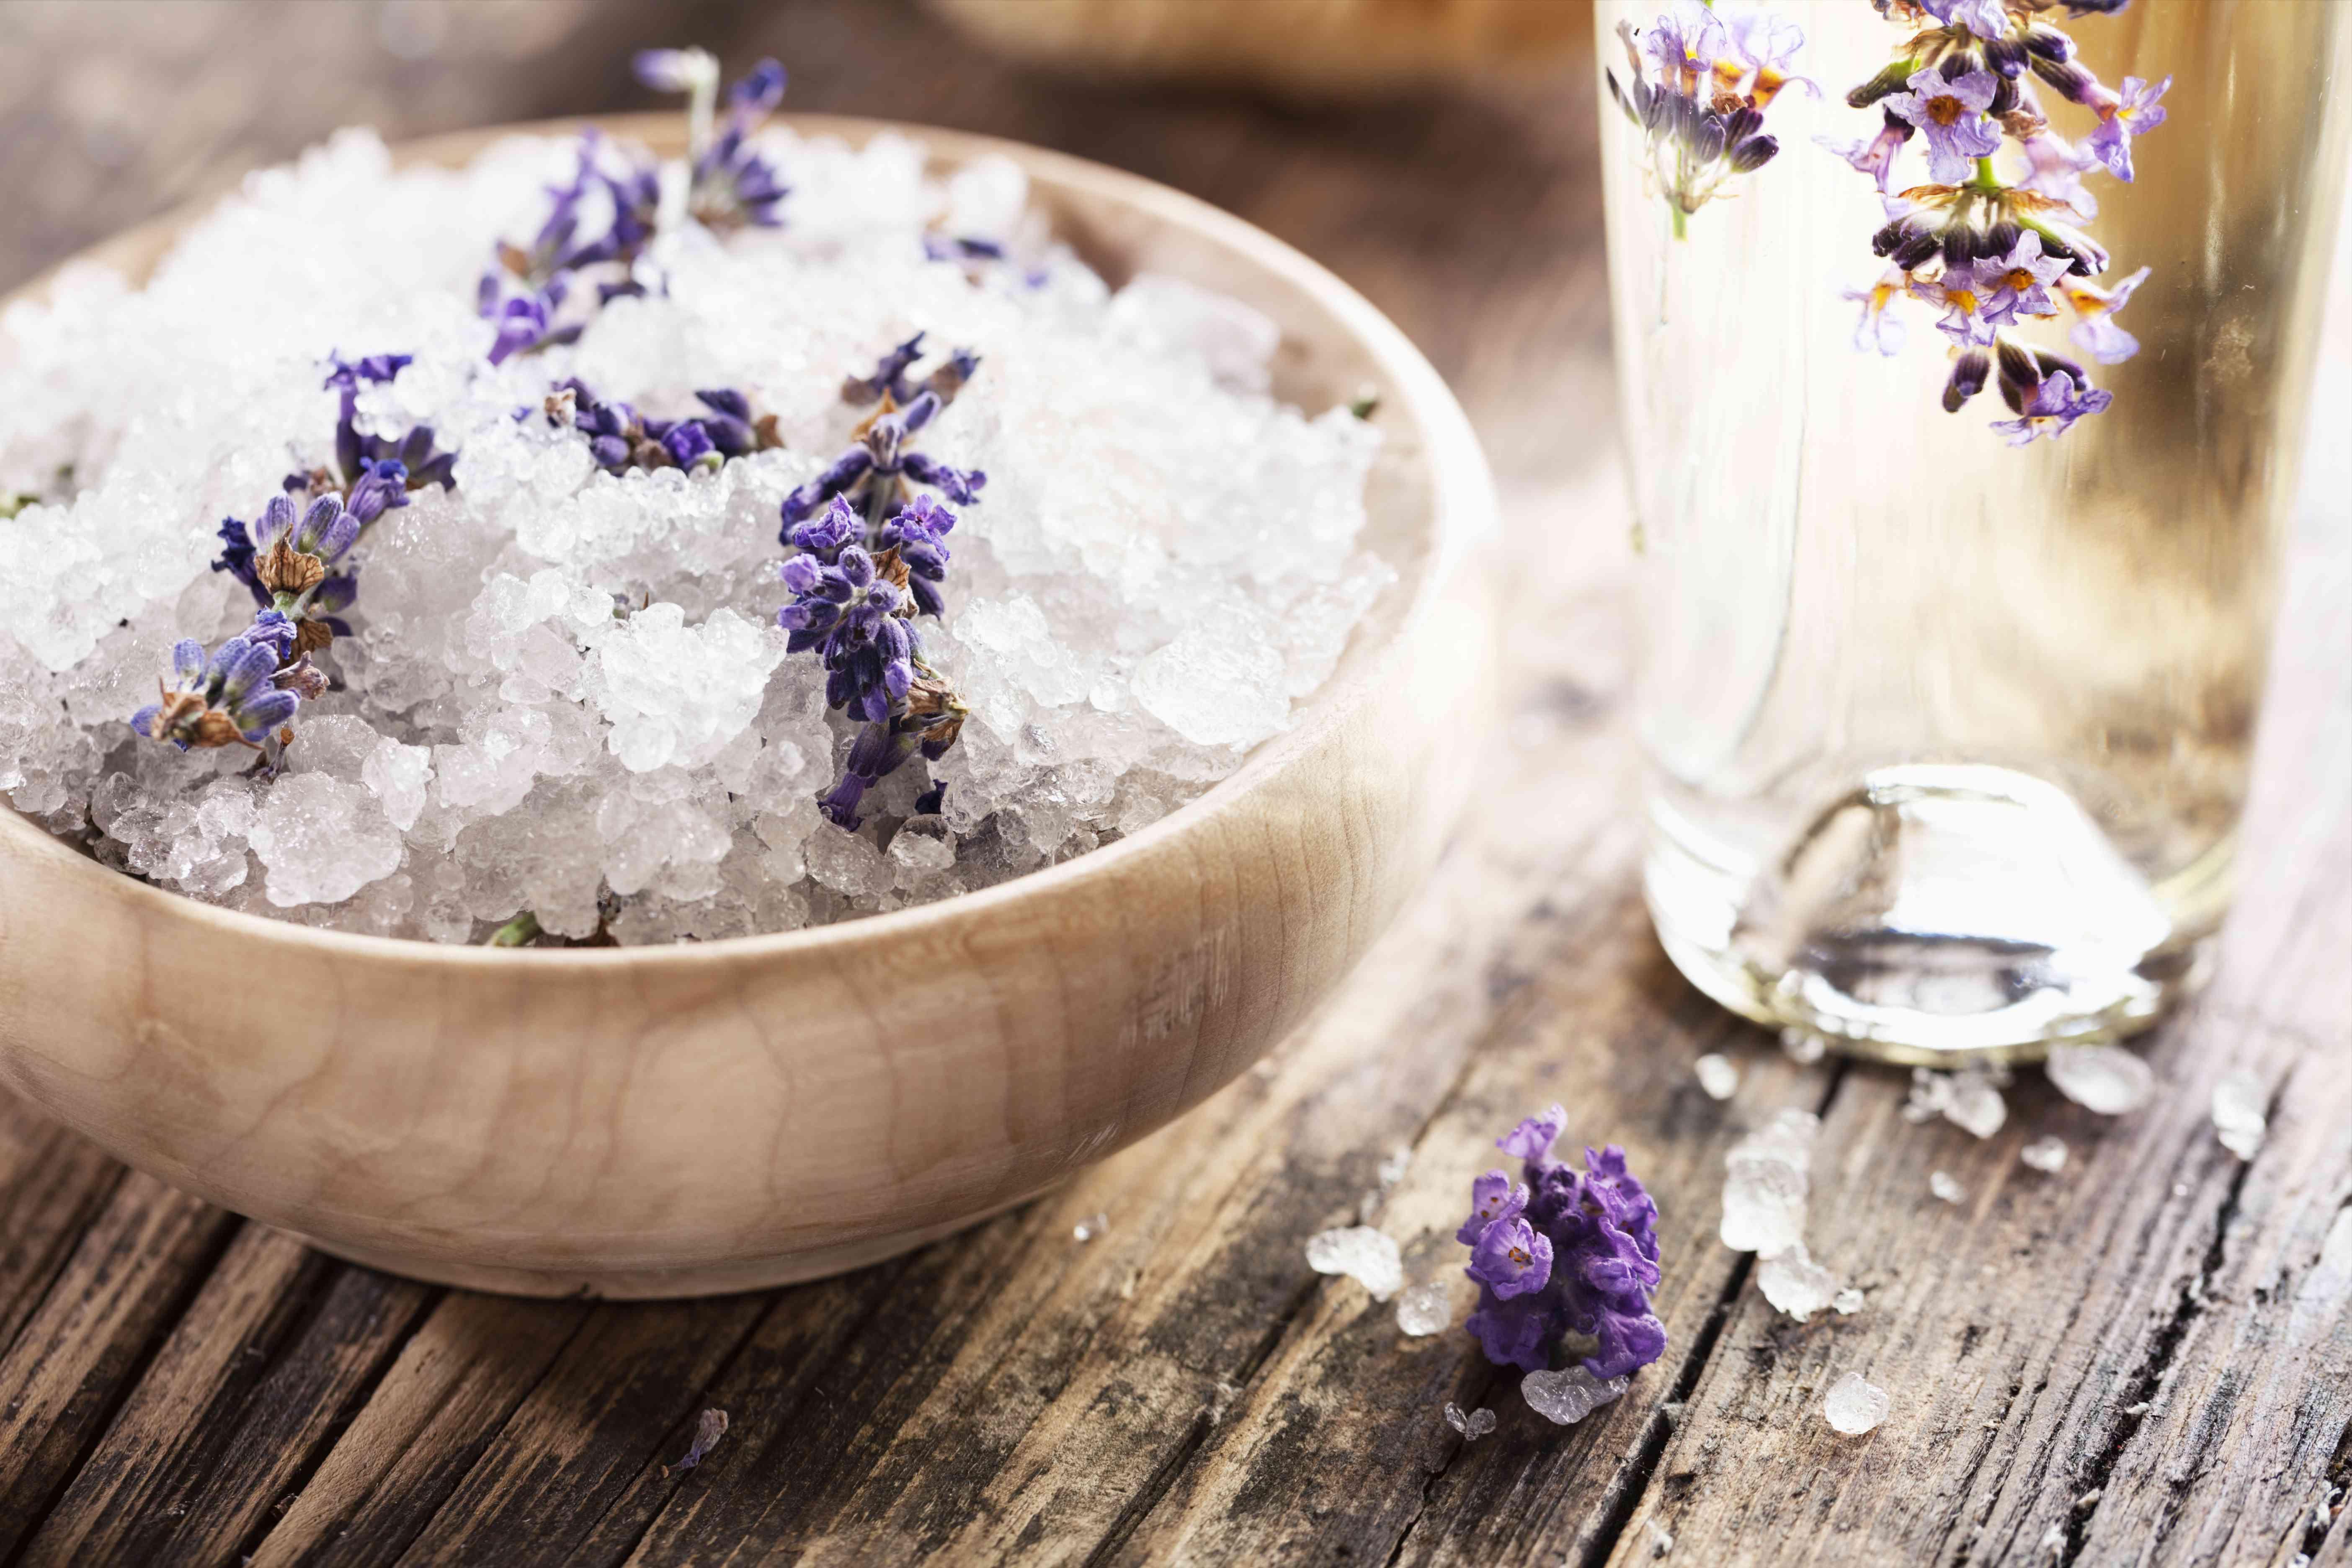 Lavender salt scrub in bowl on wooden surface